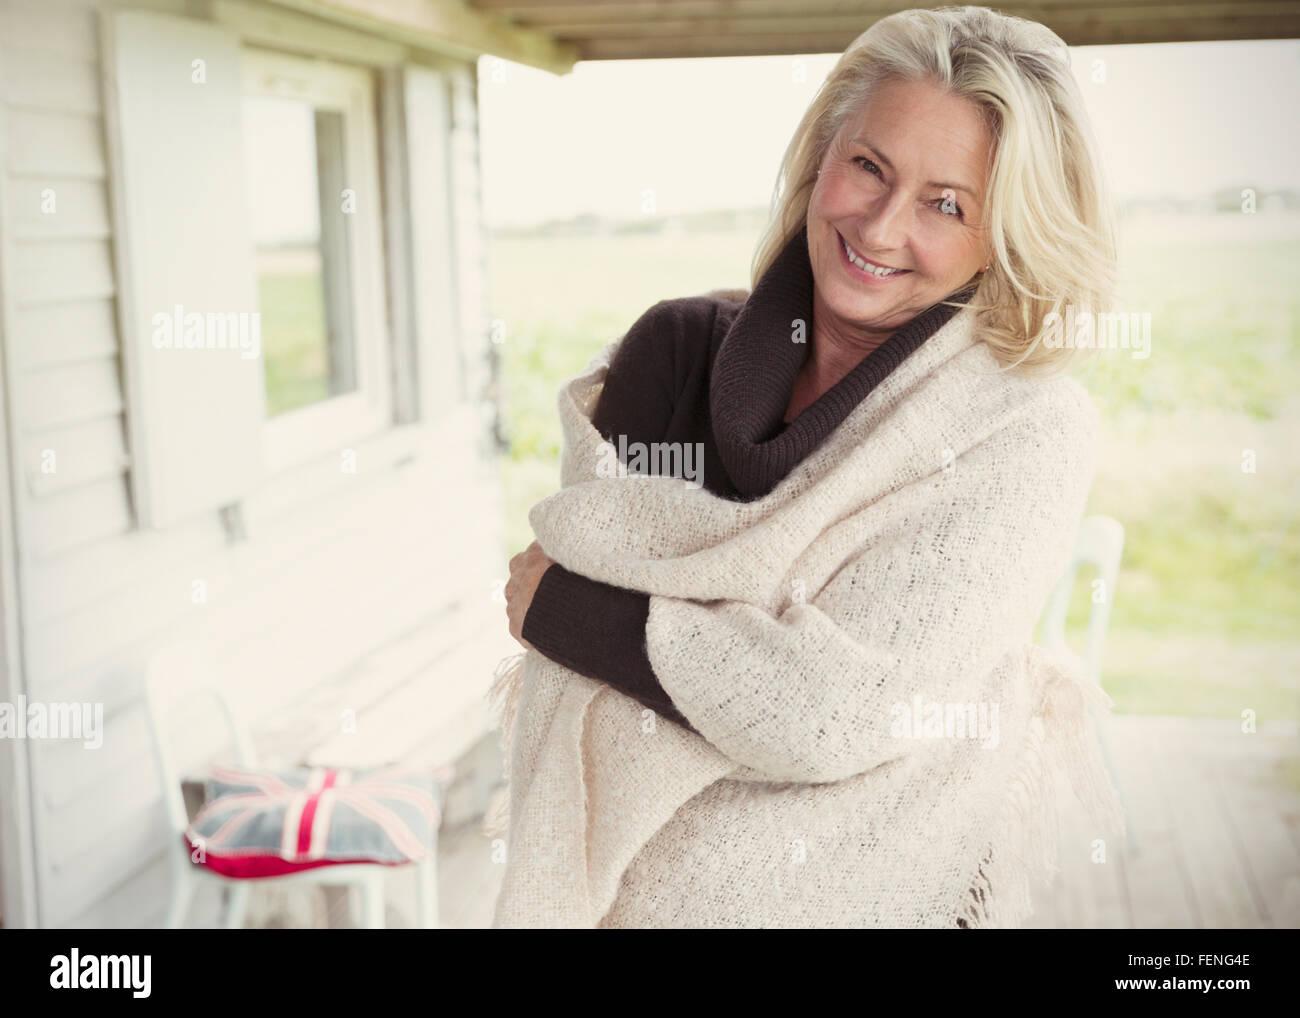 Portrait smiling senior woman wearing shawl on porch - Stock Image